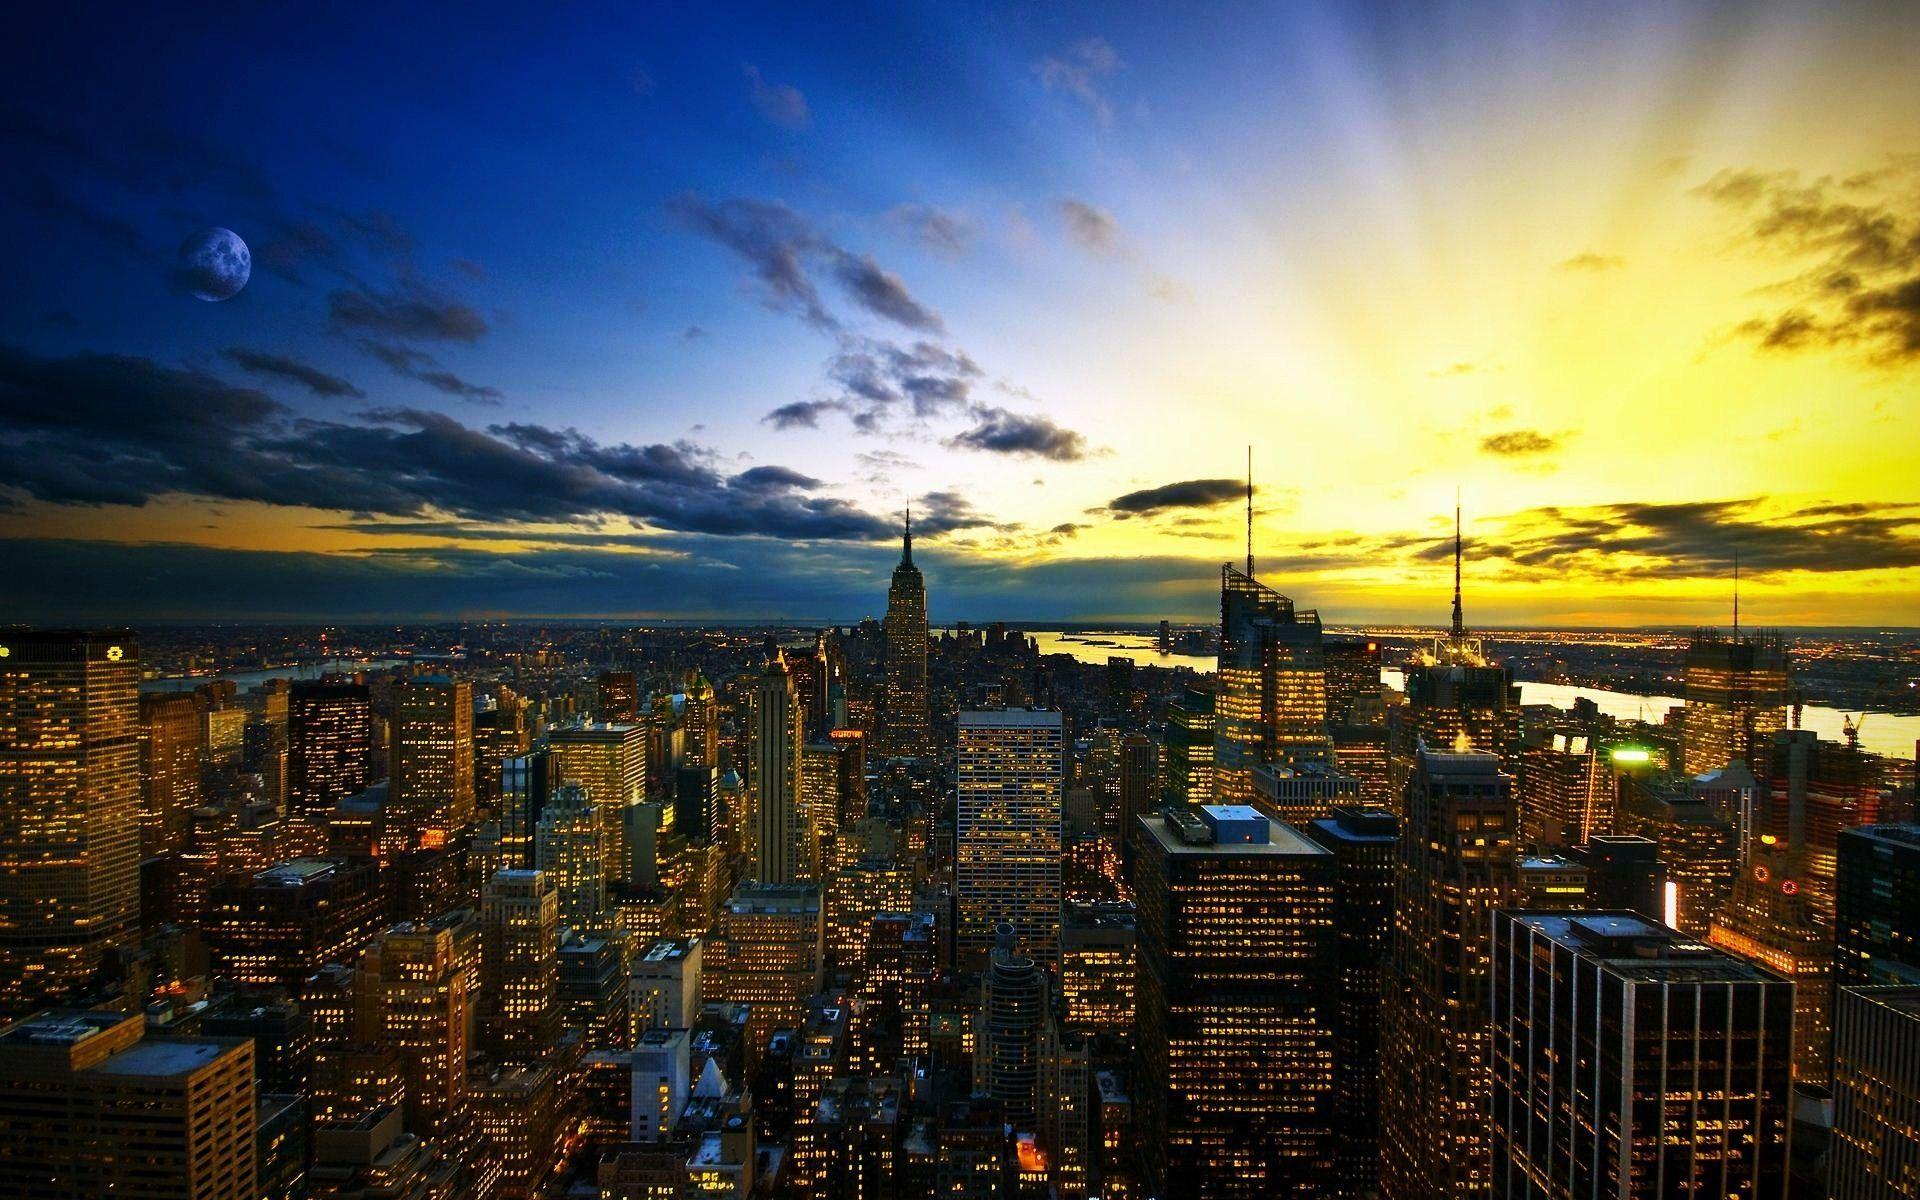 New York City Sunrise Haze Android Wallpaper Free Download 1920x1200